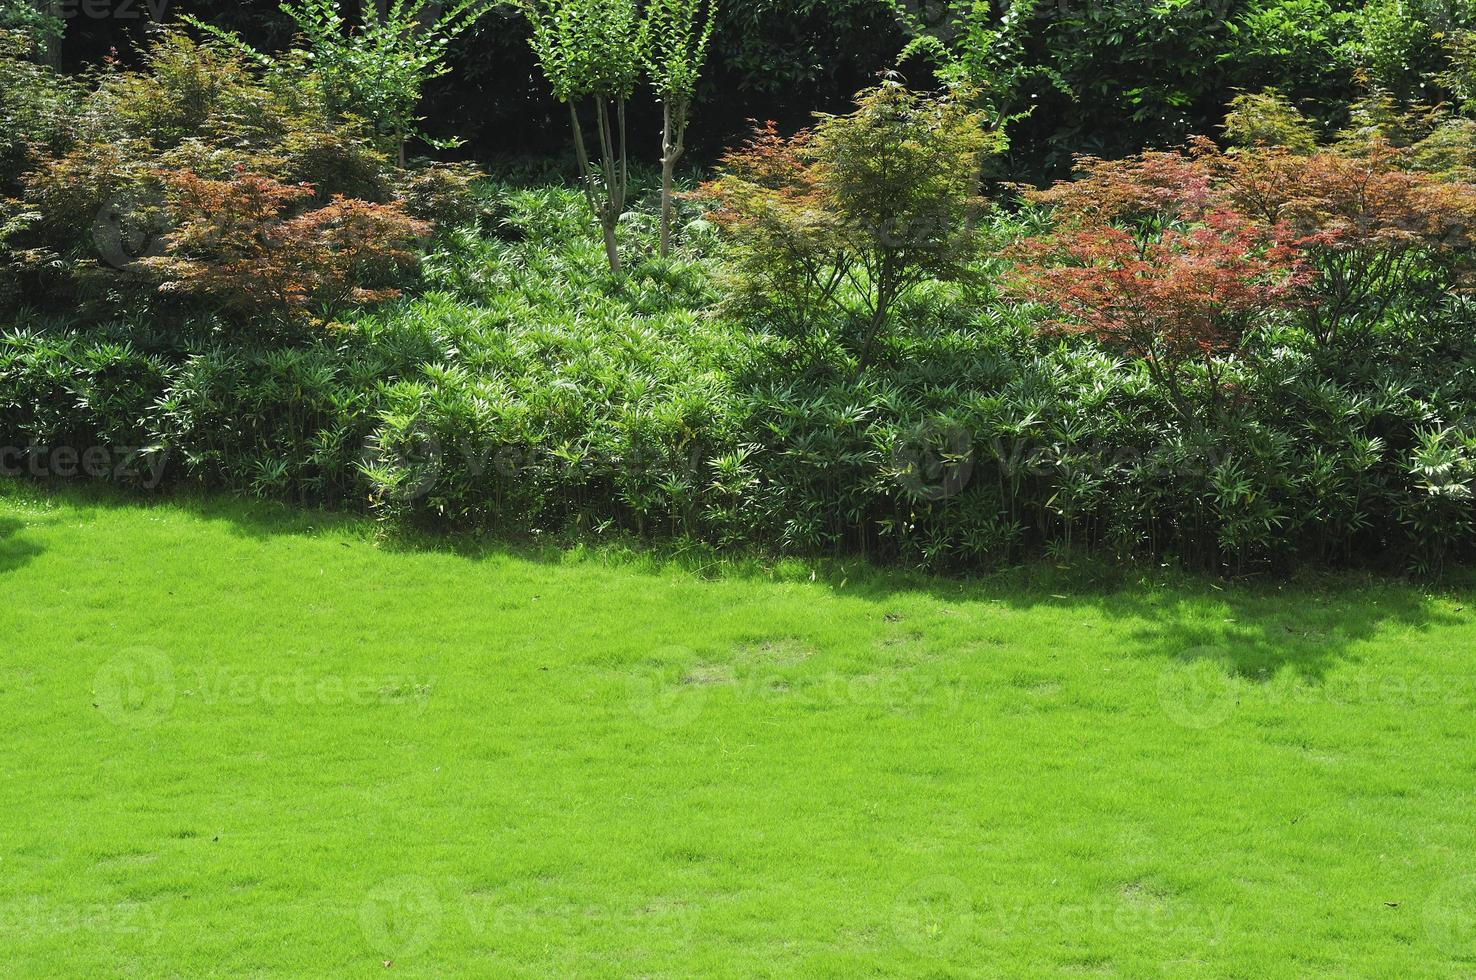 jardin tranquille photo